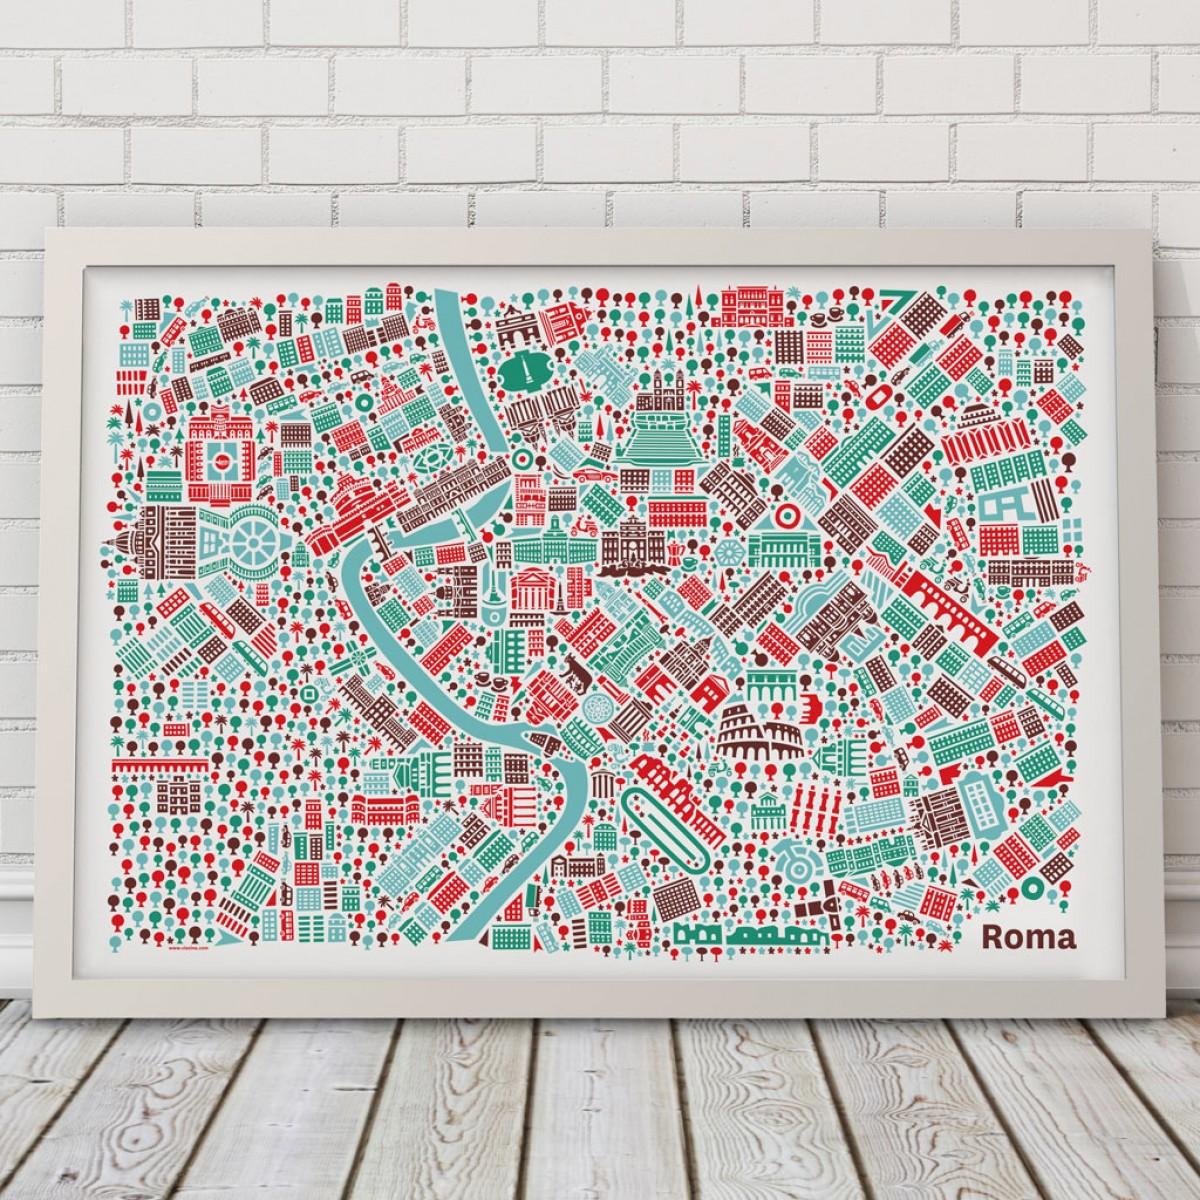 Vianina Rom Poster 100x70